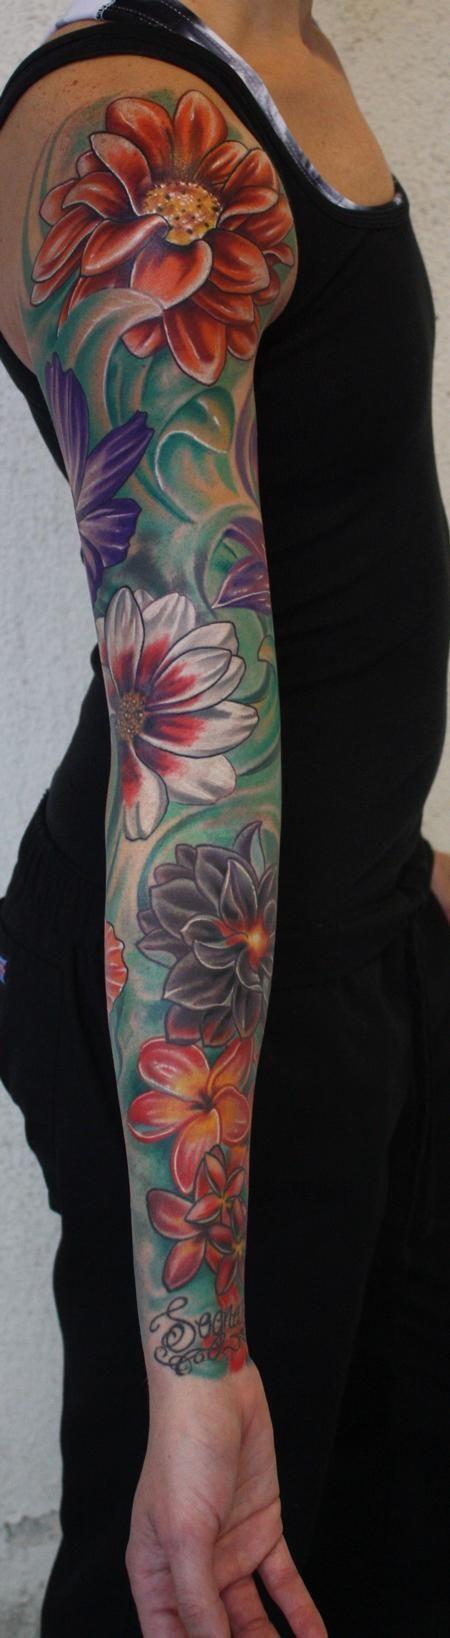 color flower sleeve tattoo  Tattoos   tatuajes | Spanish tatuajes  |tatuajes para mujeres | tatuajes para hombres  | diseños de tatuajes http://amzn.to/28PQlav